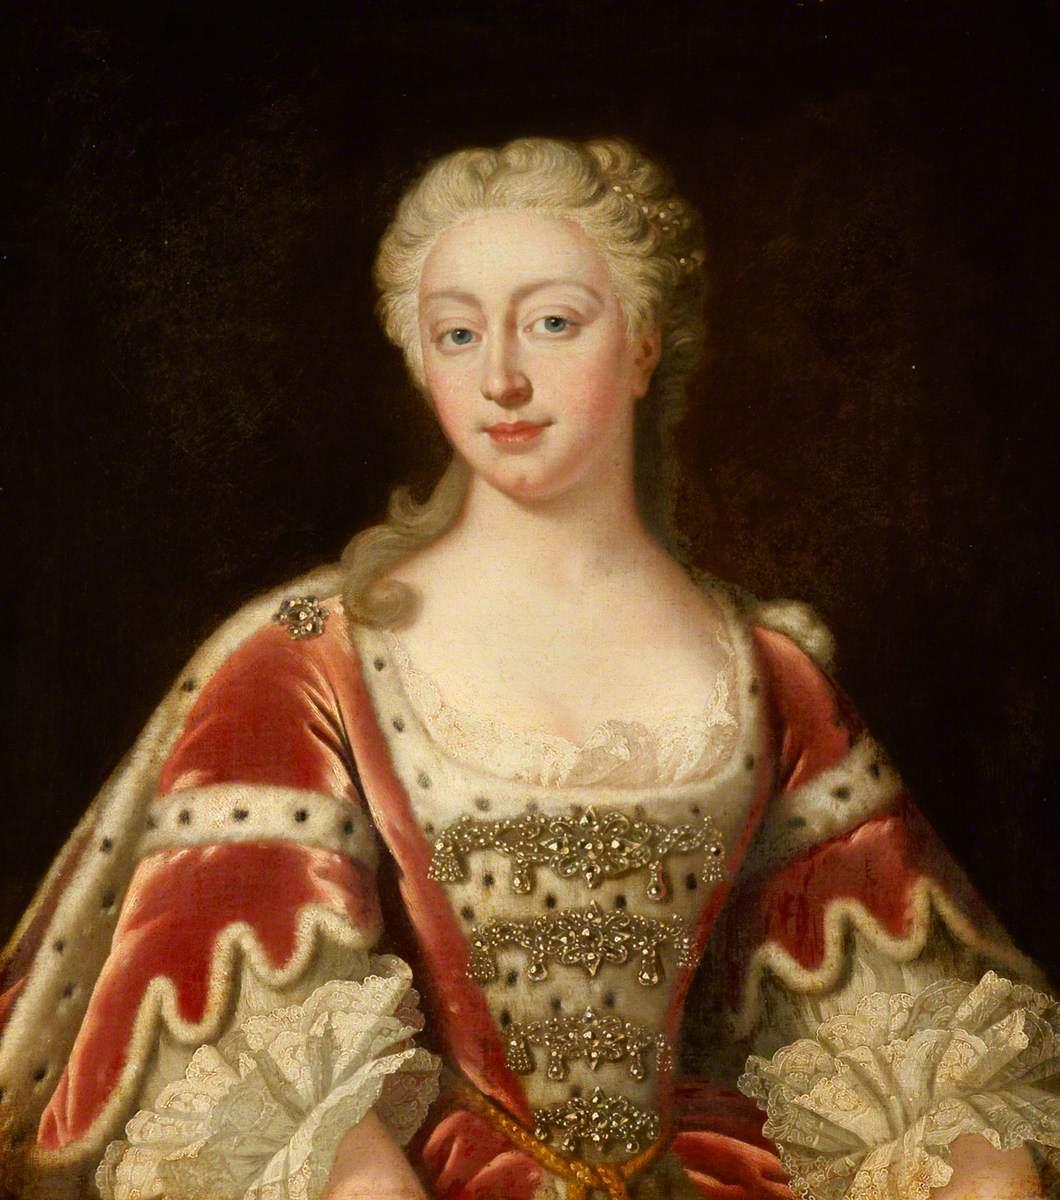 Augusta of Saxe-Gotha (1719–1772), Princess of Wales